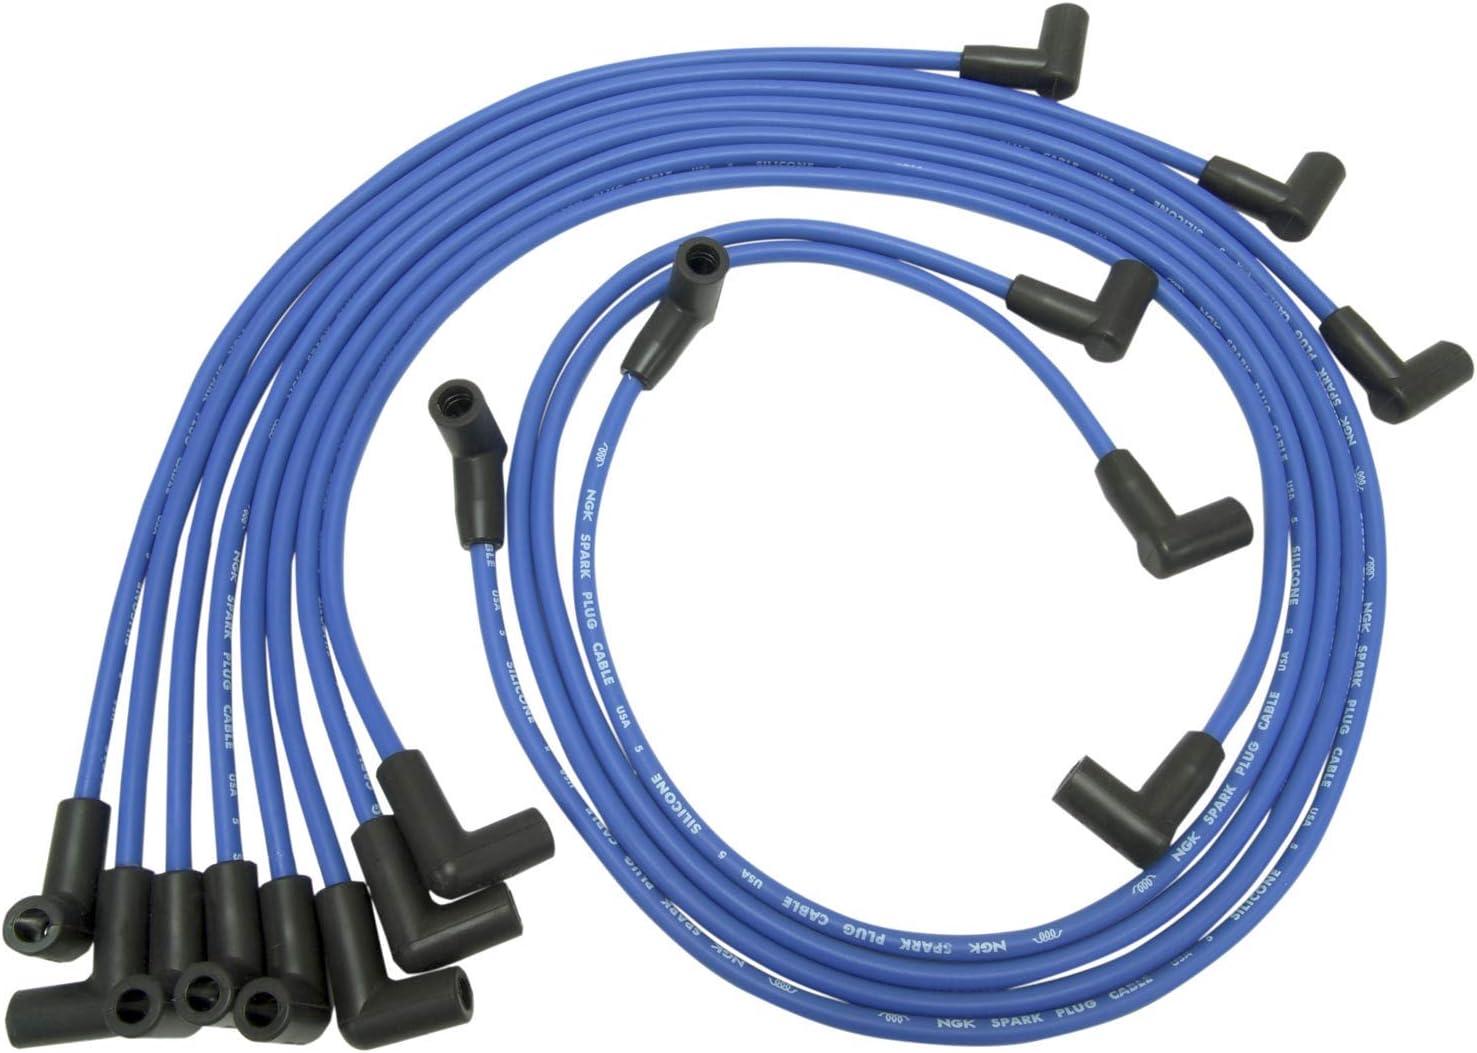 51376 NGK RC-GMZ010 Spark Plug Wire Set